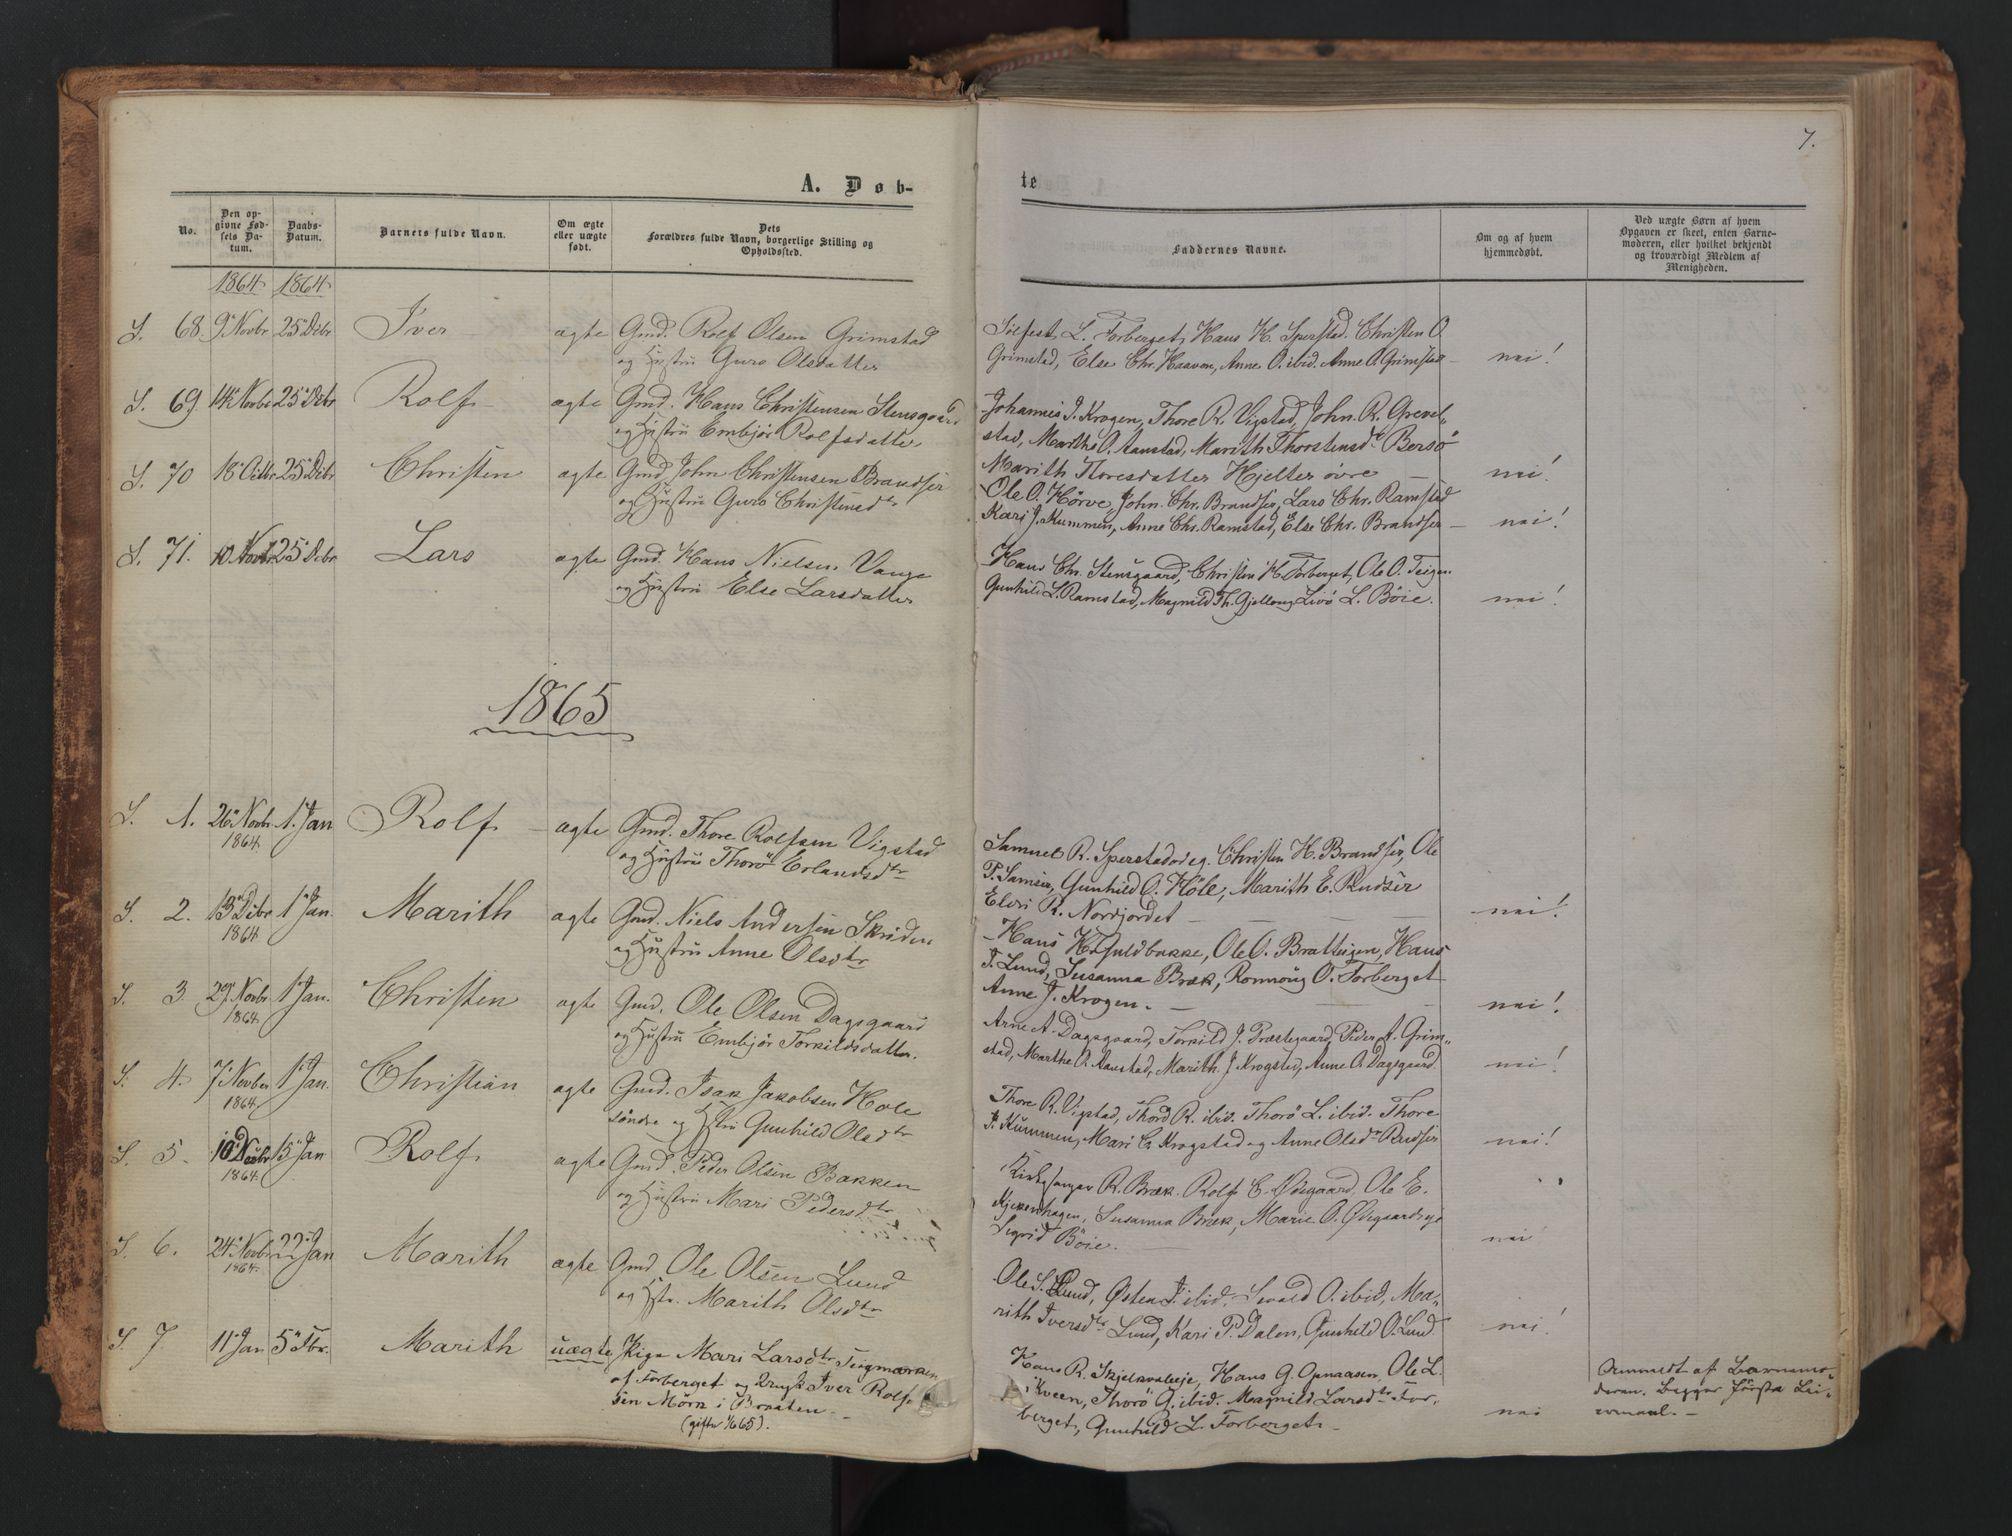 SAH, Skjåk prestekontor, Ministerialbok nr. 1, 1863-1879, s. 7